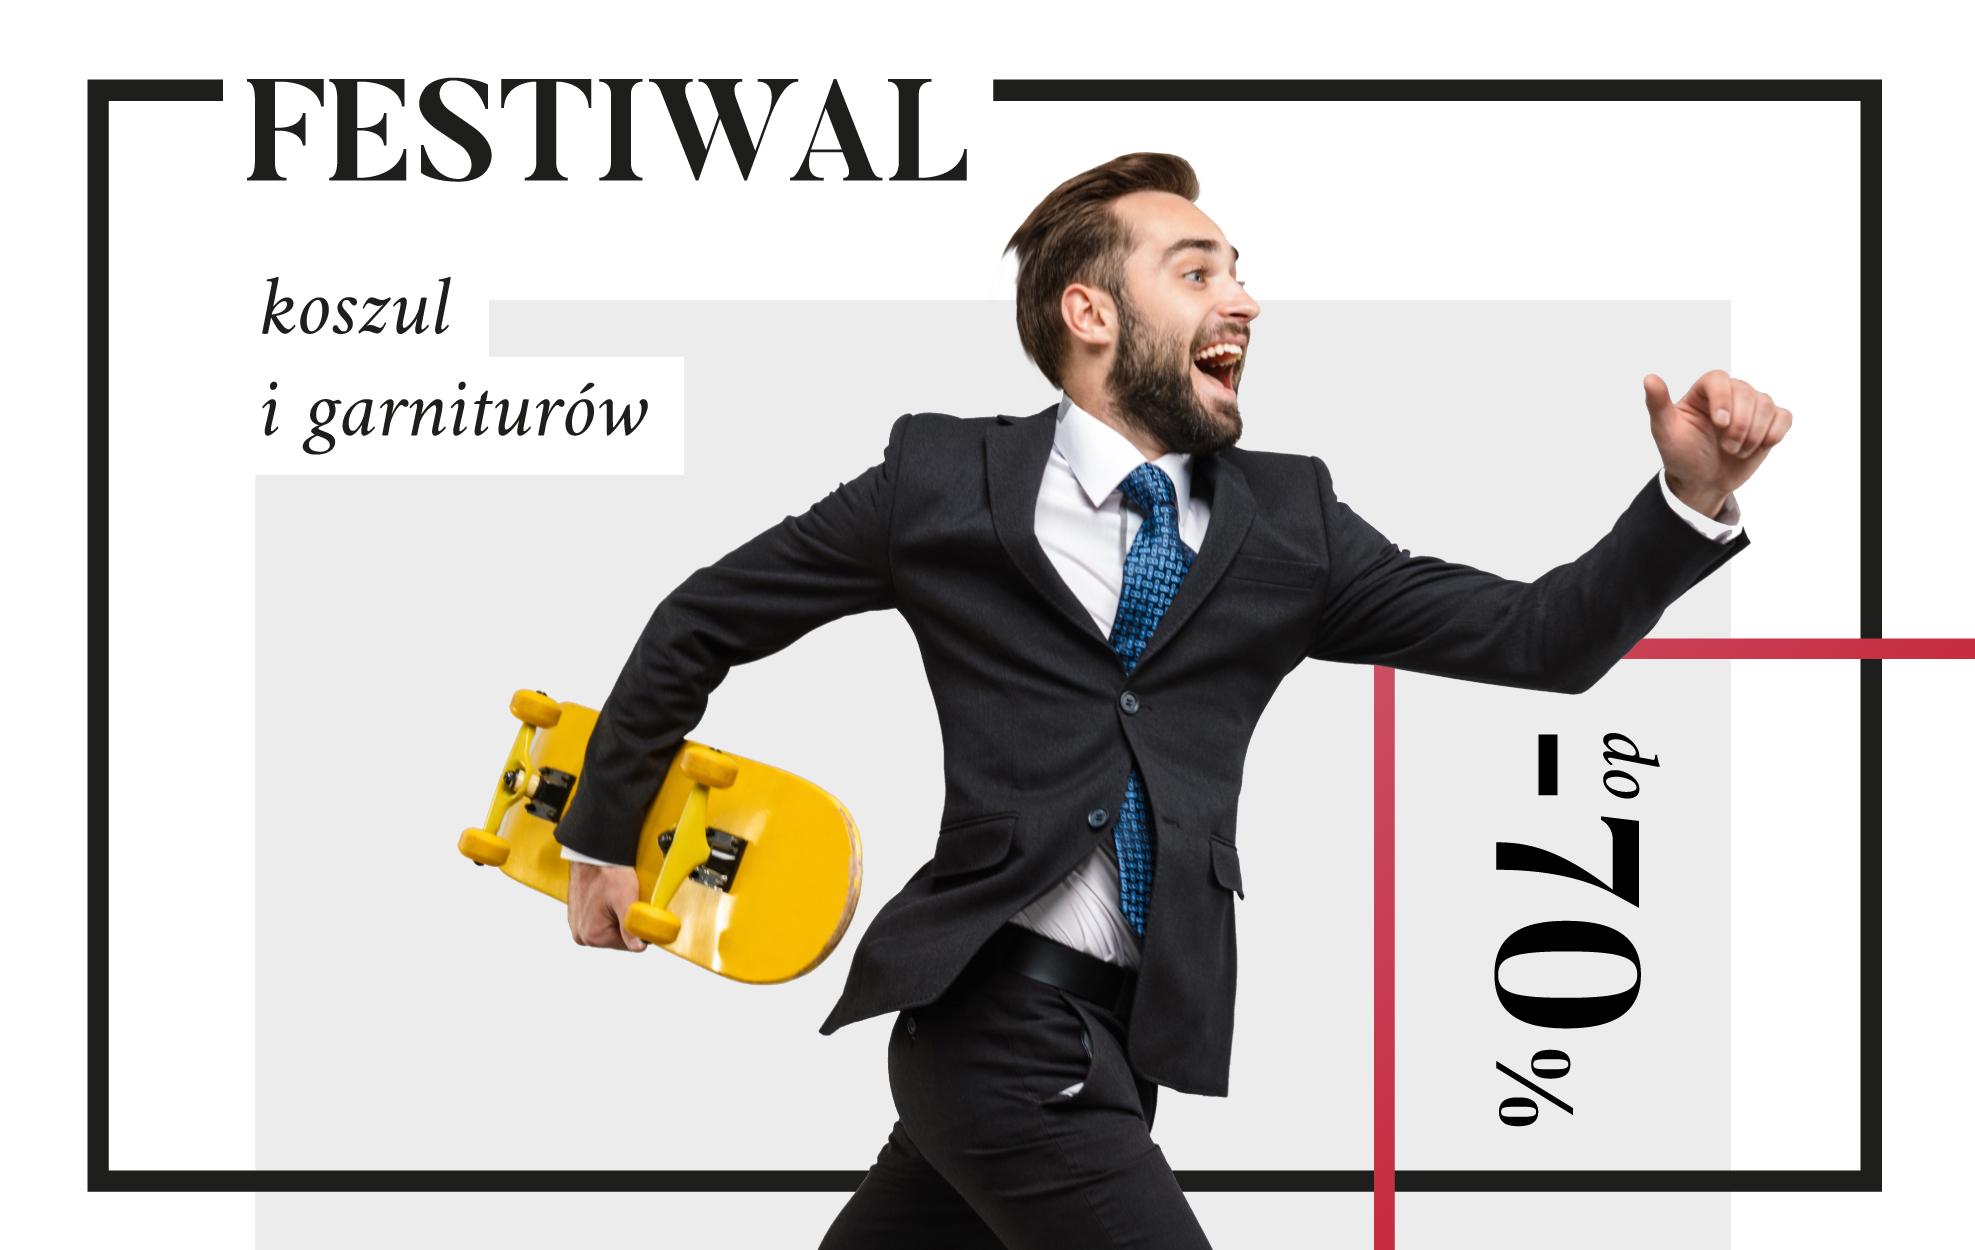 Festiwal koszul igarniturów